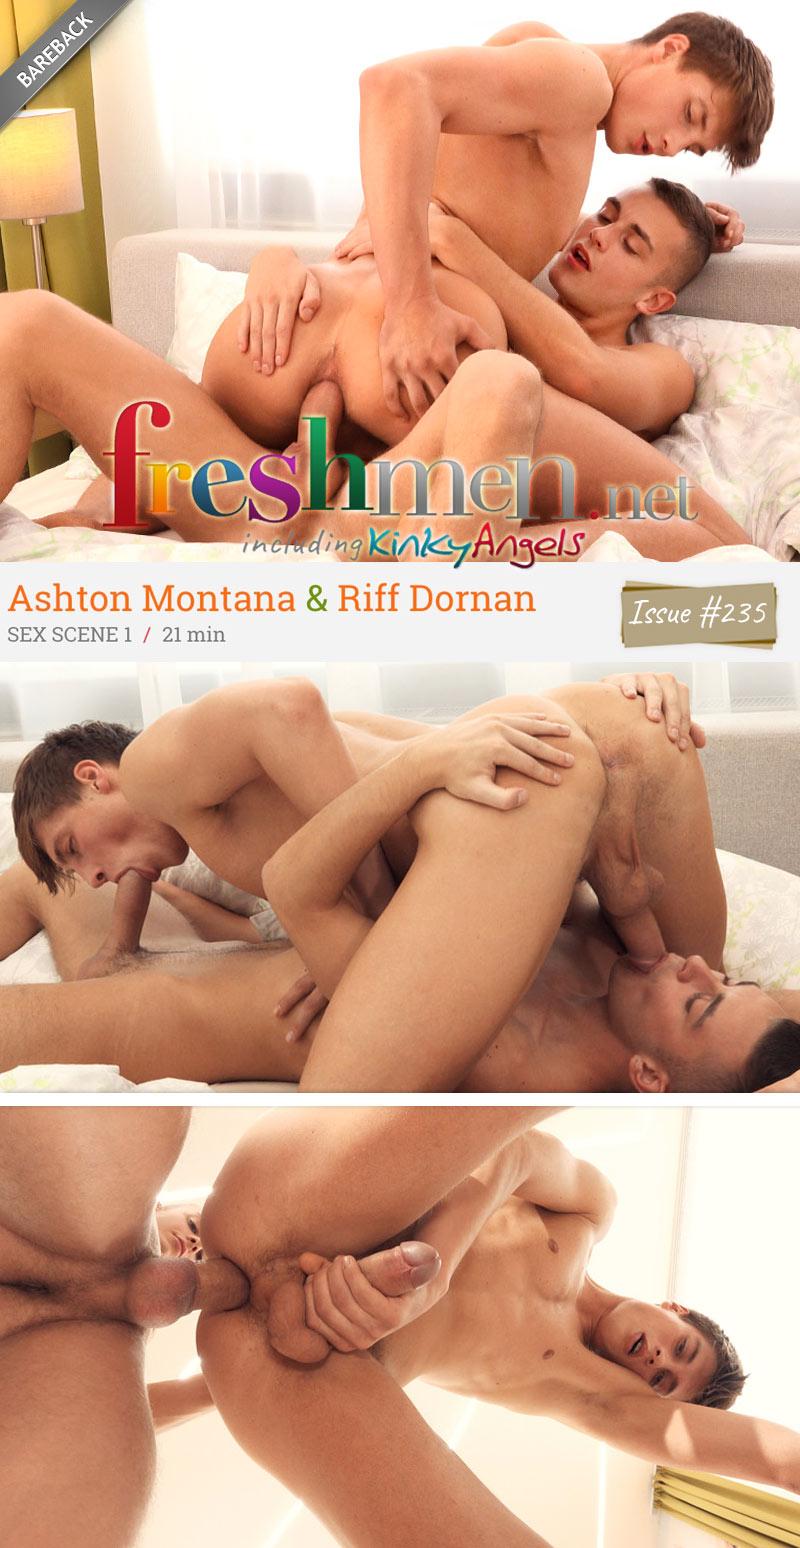 Issue 245, Scene 1 (Ashton Montana Bottoms For Riff Dornan) at Freshmen.net